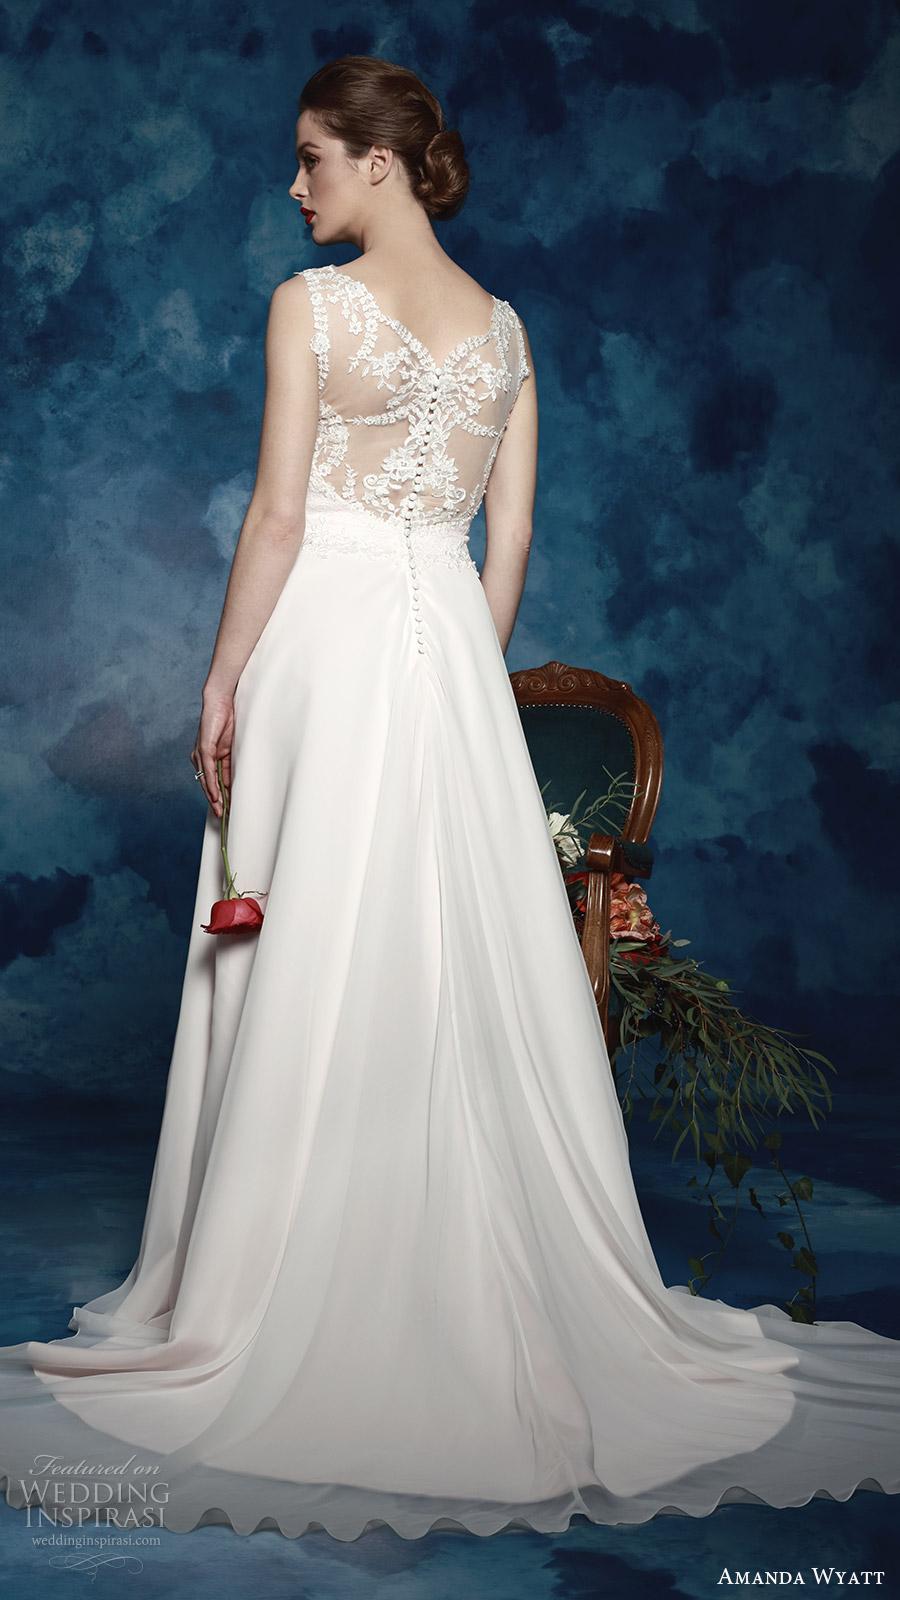 amanda wyatt bridal 2017 sleeveless thick straps lace a line wedding dress (lettie) bv illusion back romantic elegant